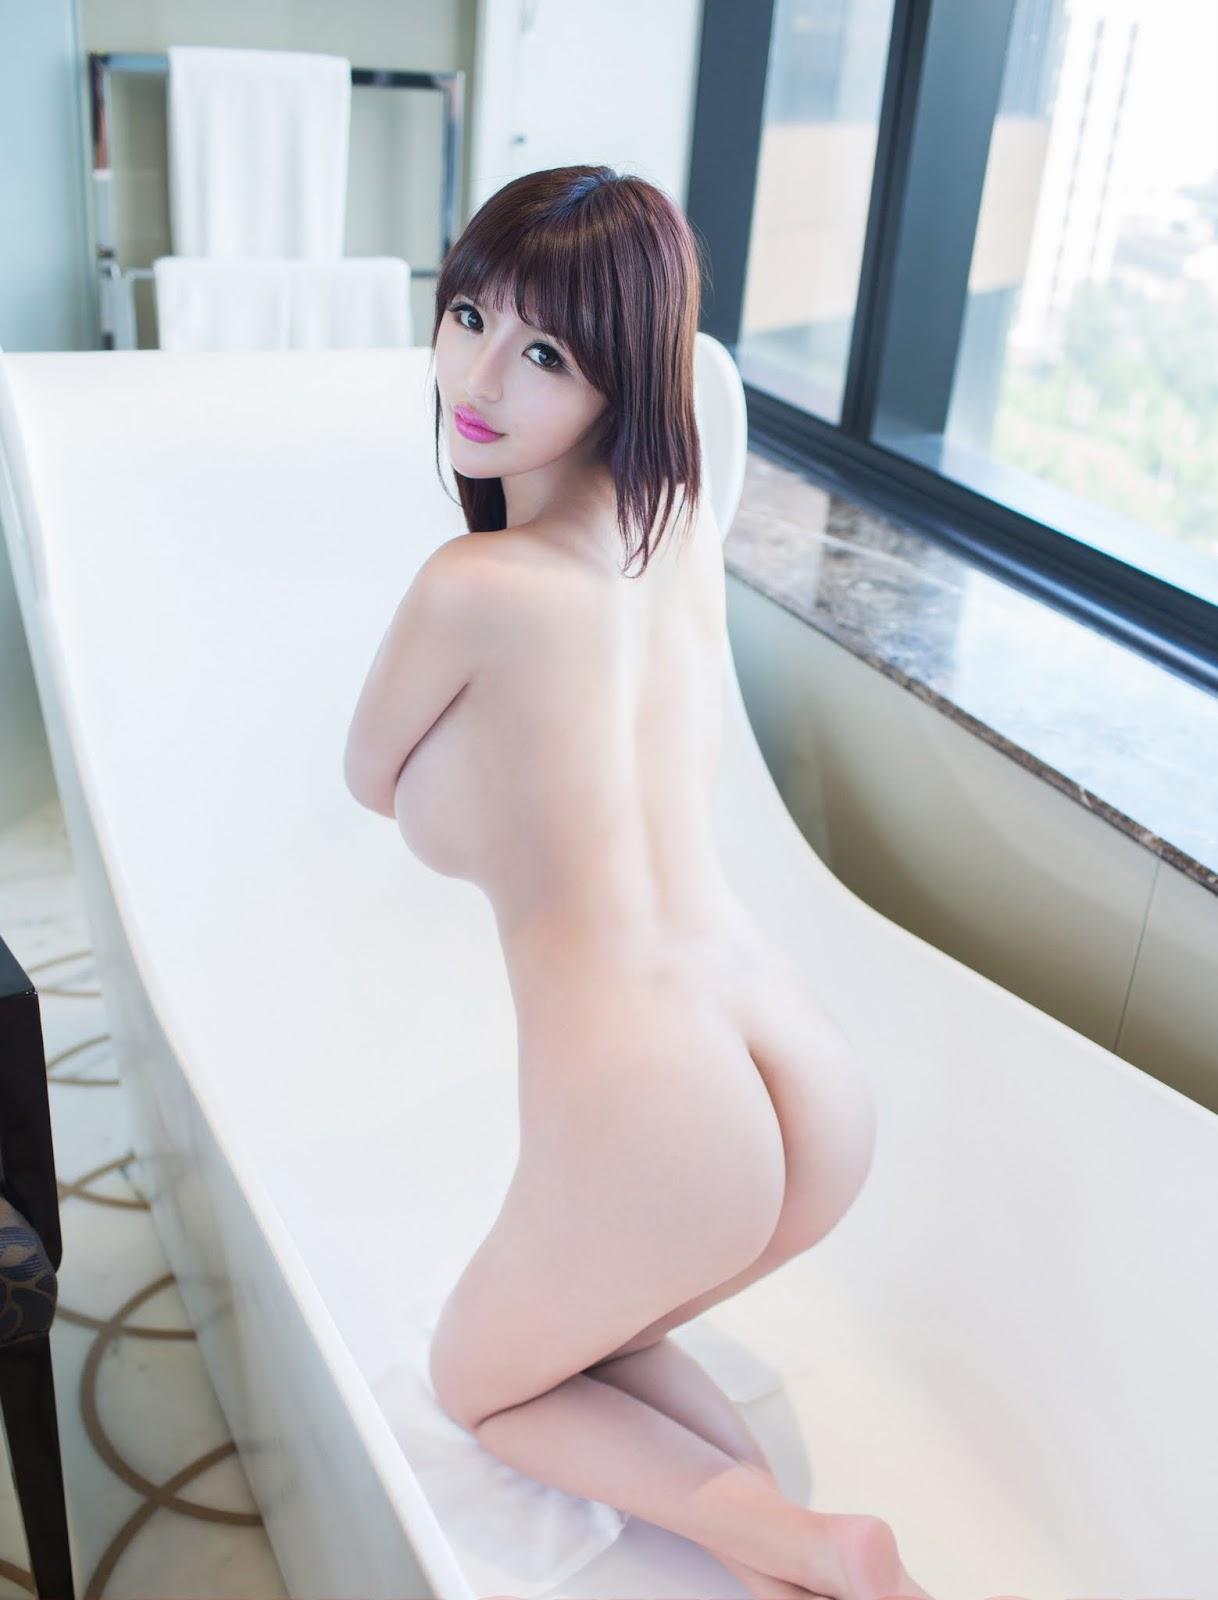 Naked latino girl sex